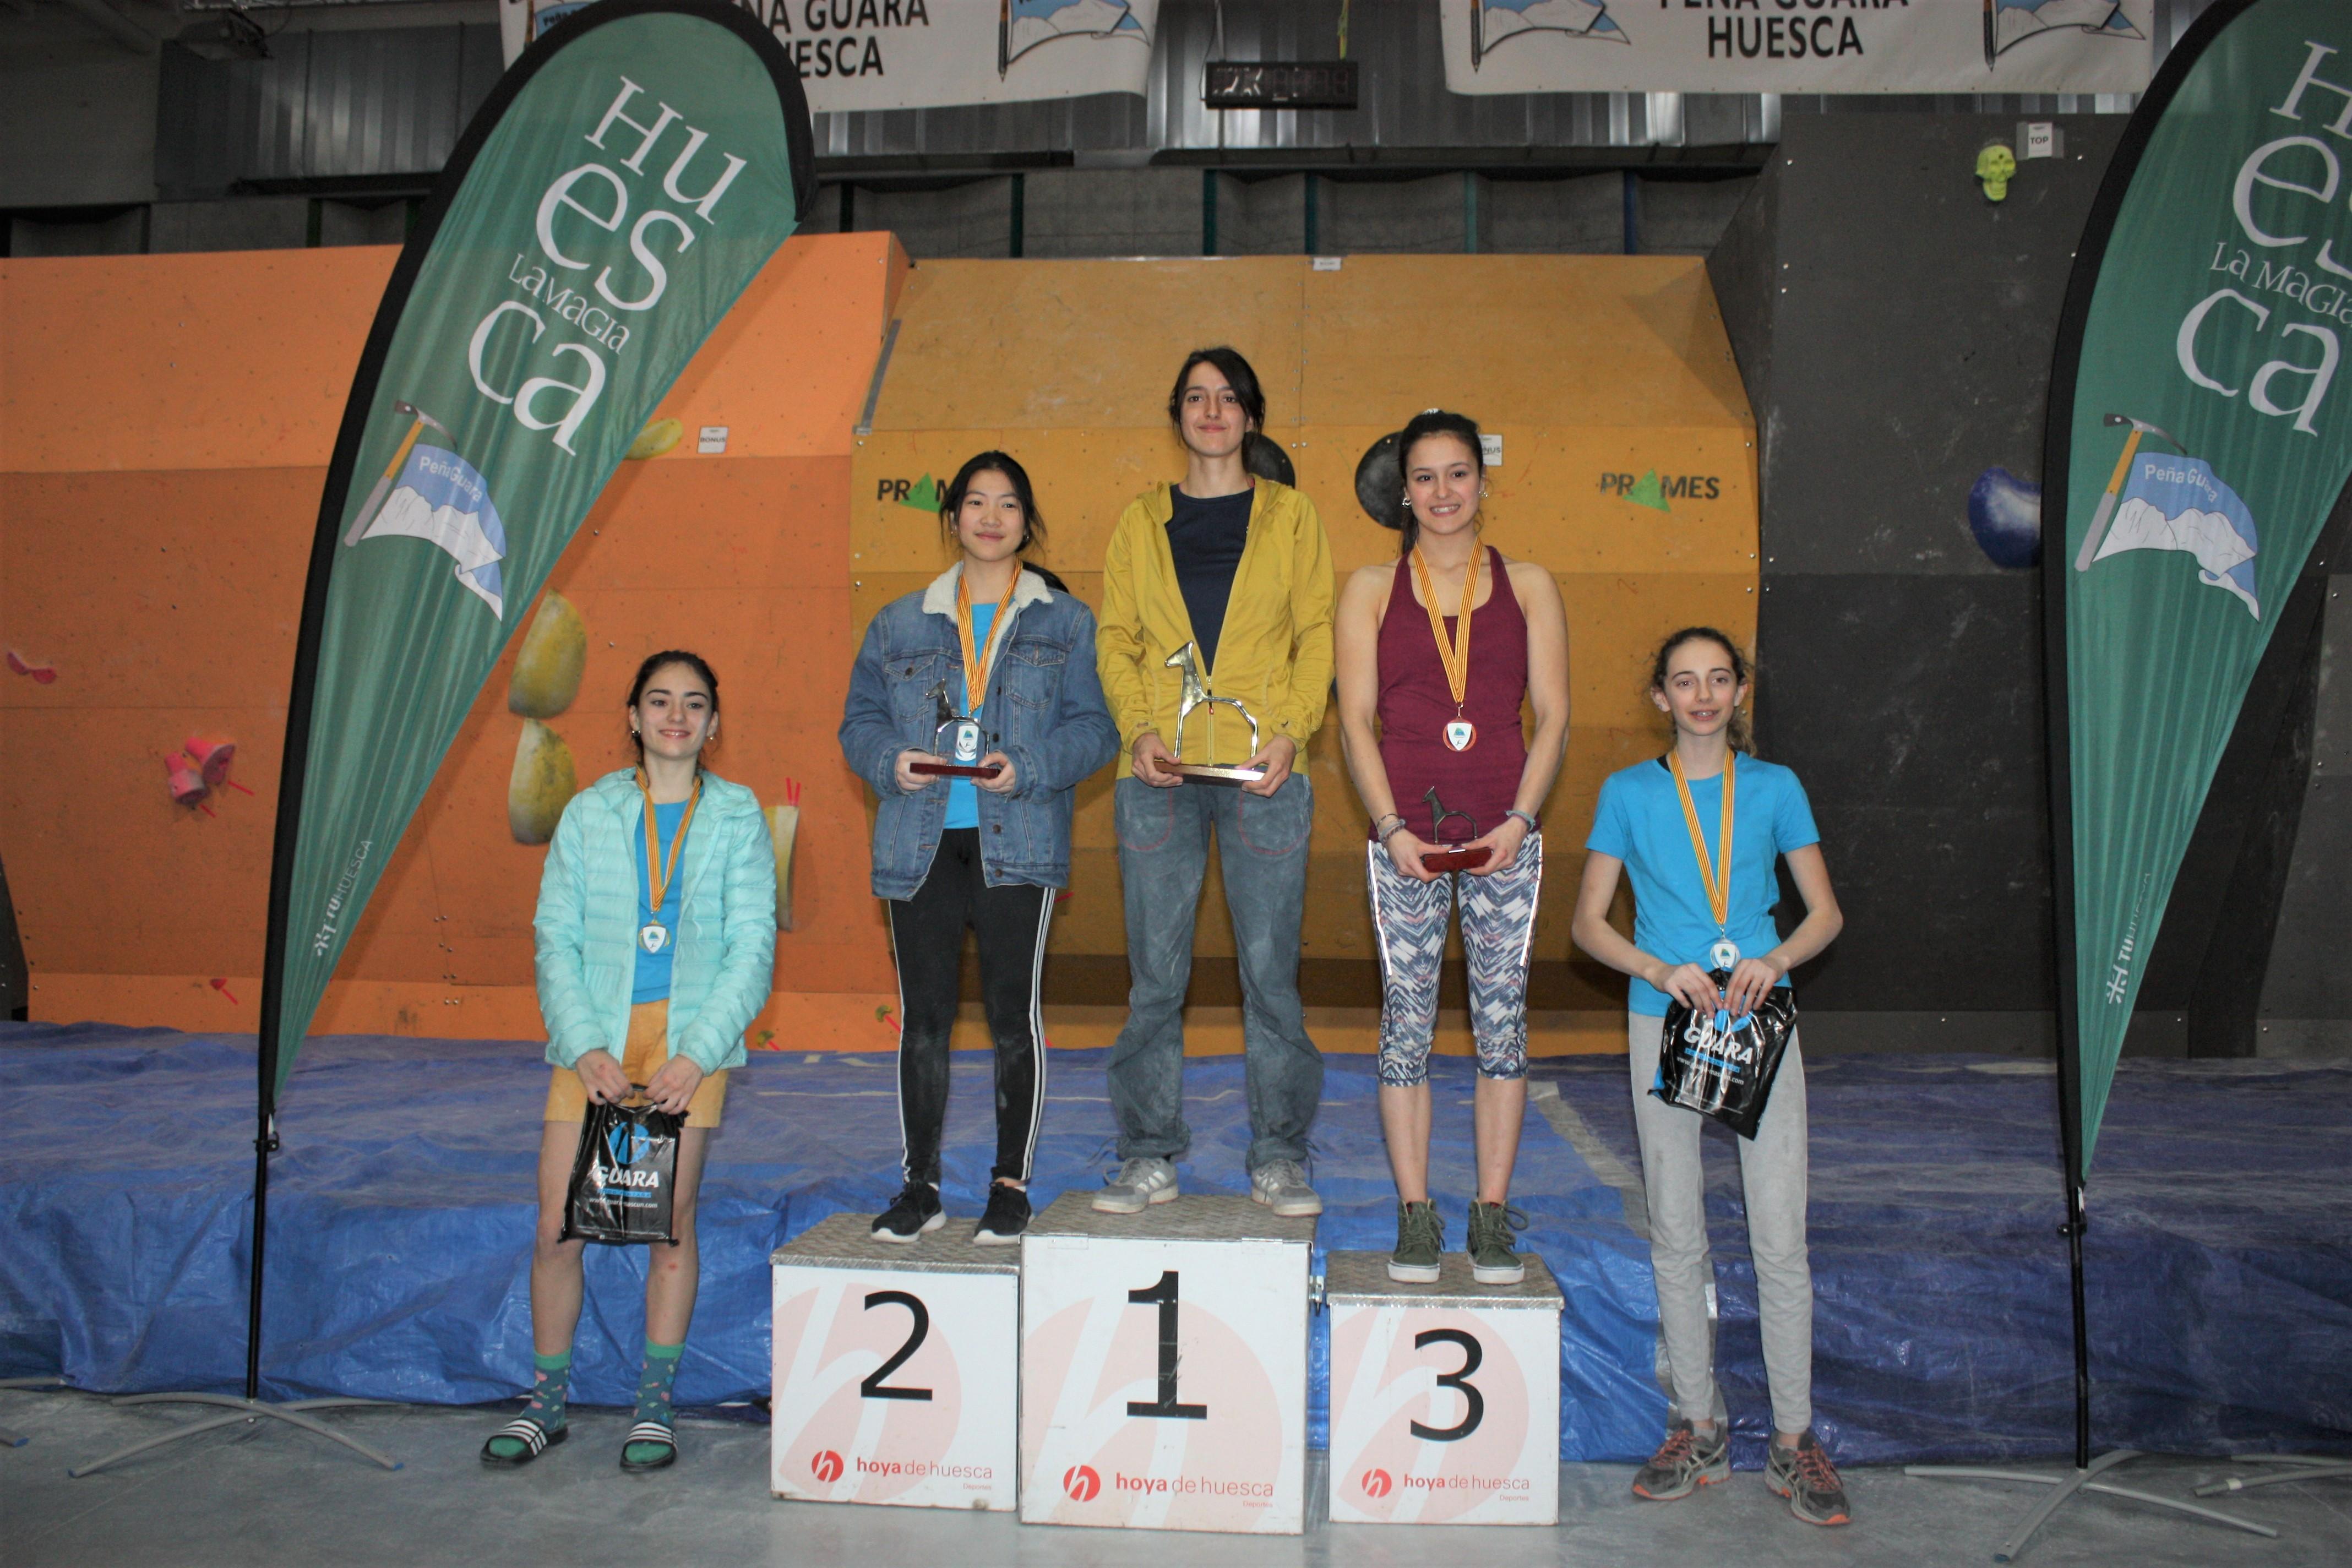 Podium femenino (De Izd a dcha)- Maria Laborda (4), Laura Pellicer (2), Rebeca Pérez (1), Carlota Martínez (3) y Edurne García (5)